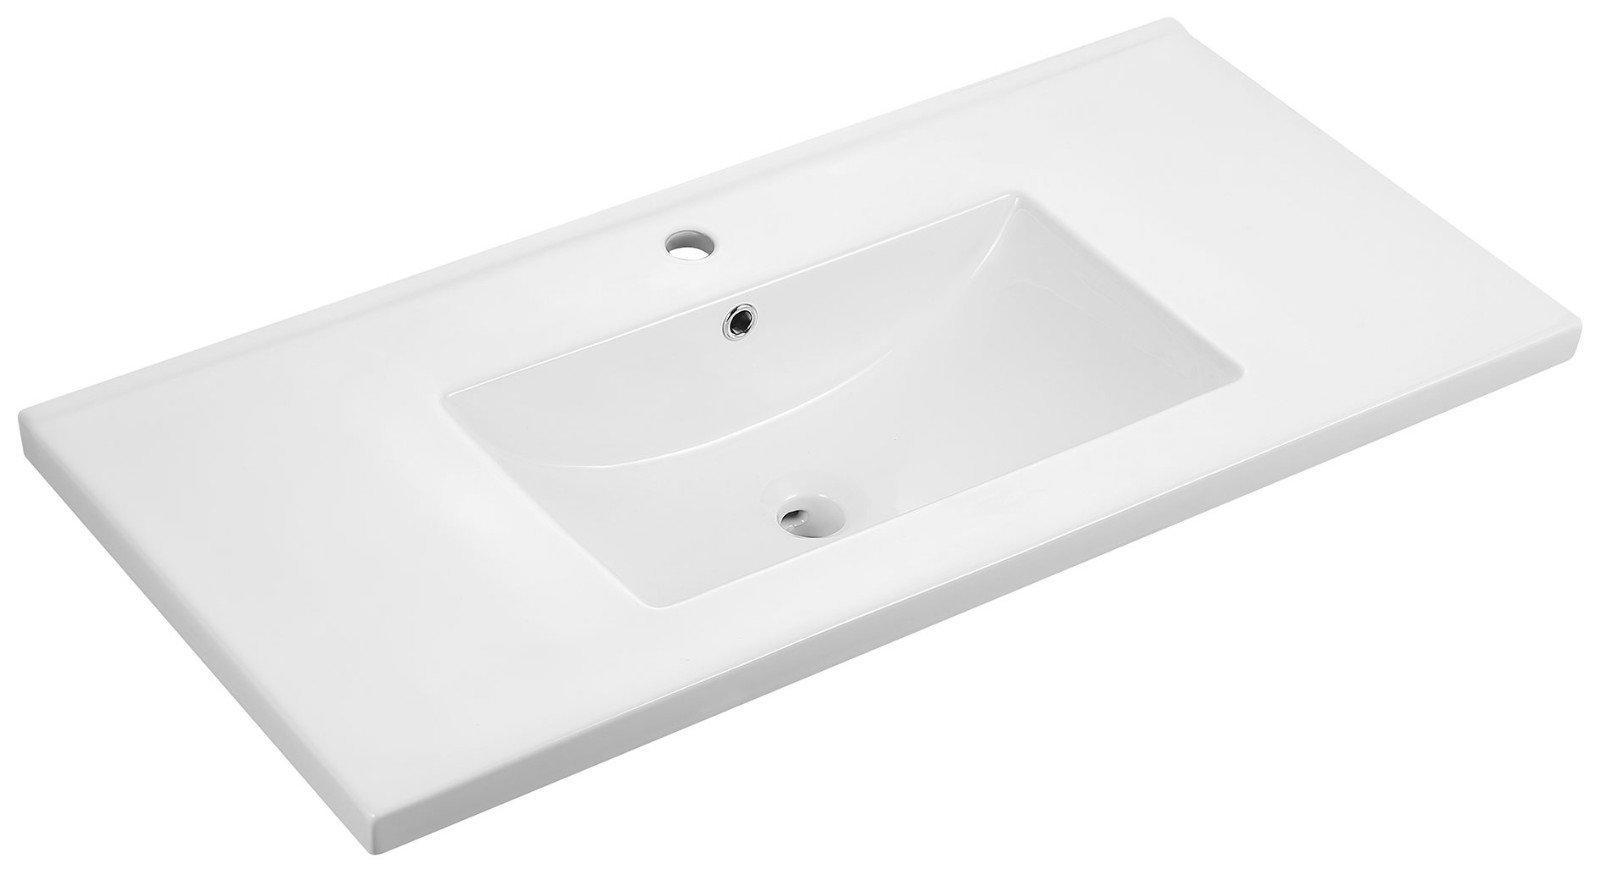 Ceramic Washbasin - Paris Spring Series